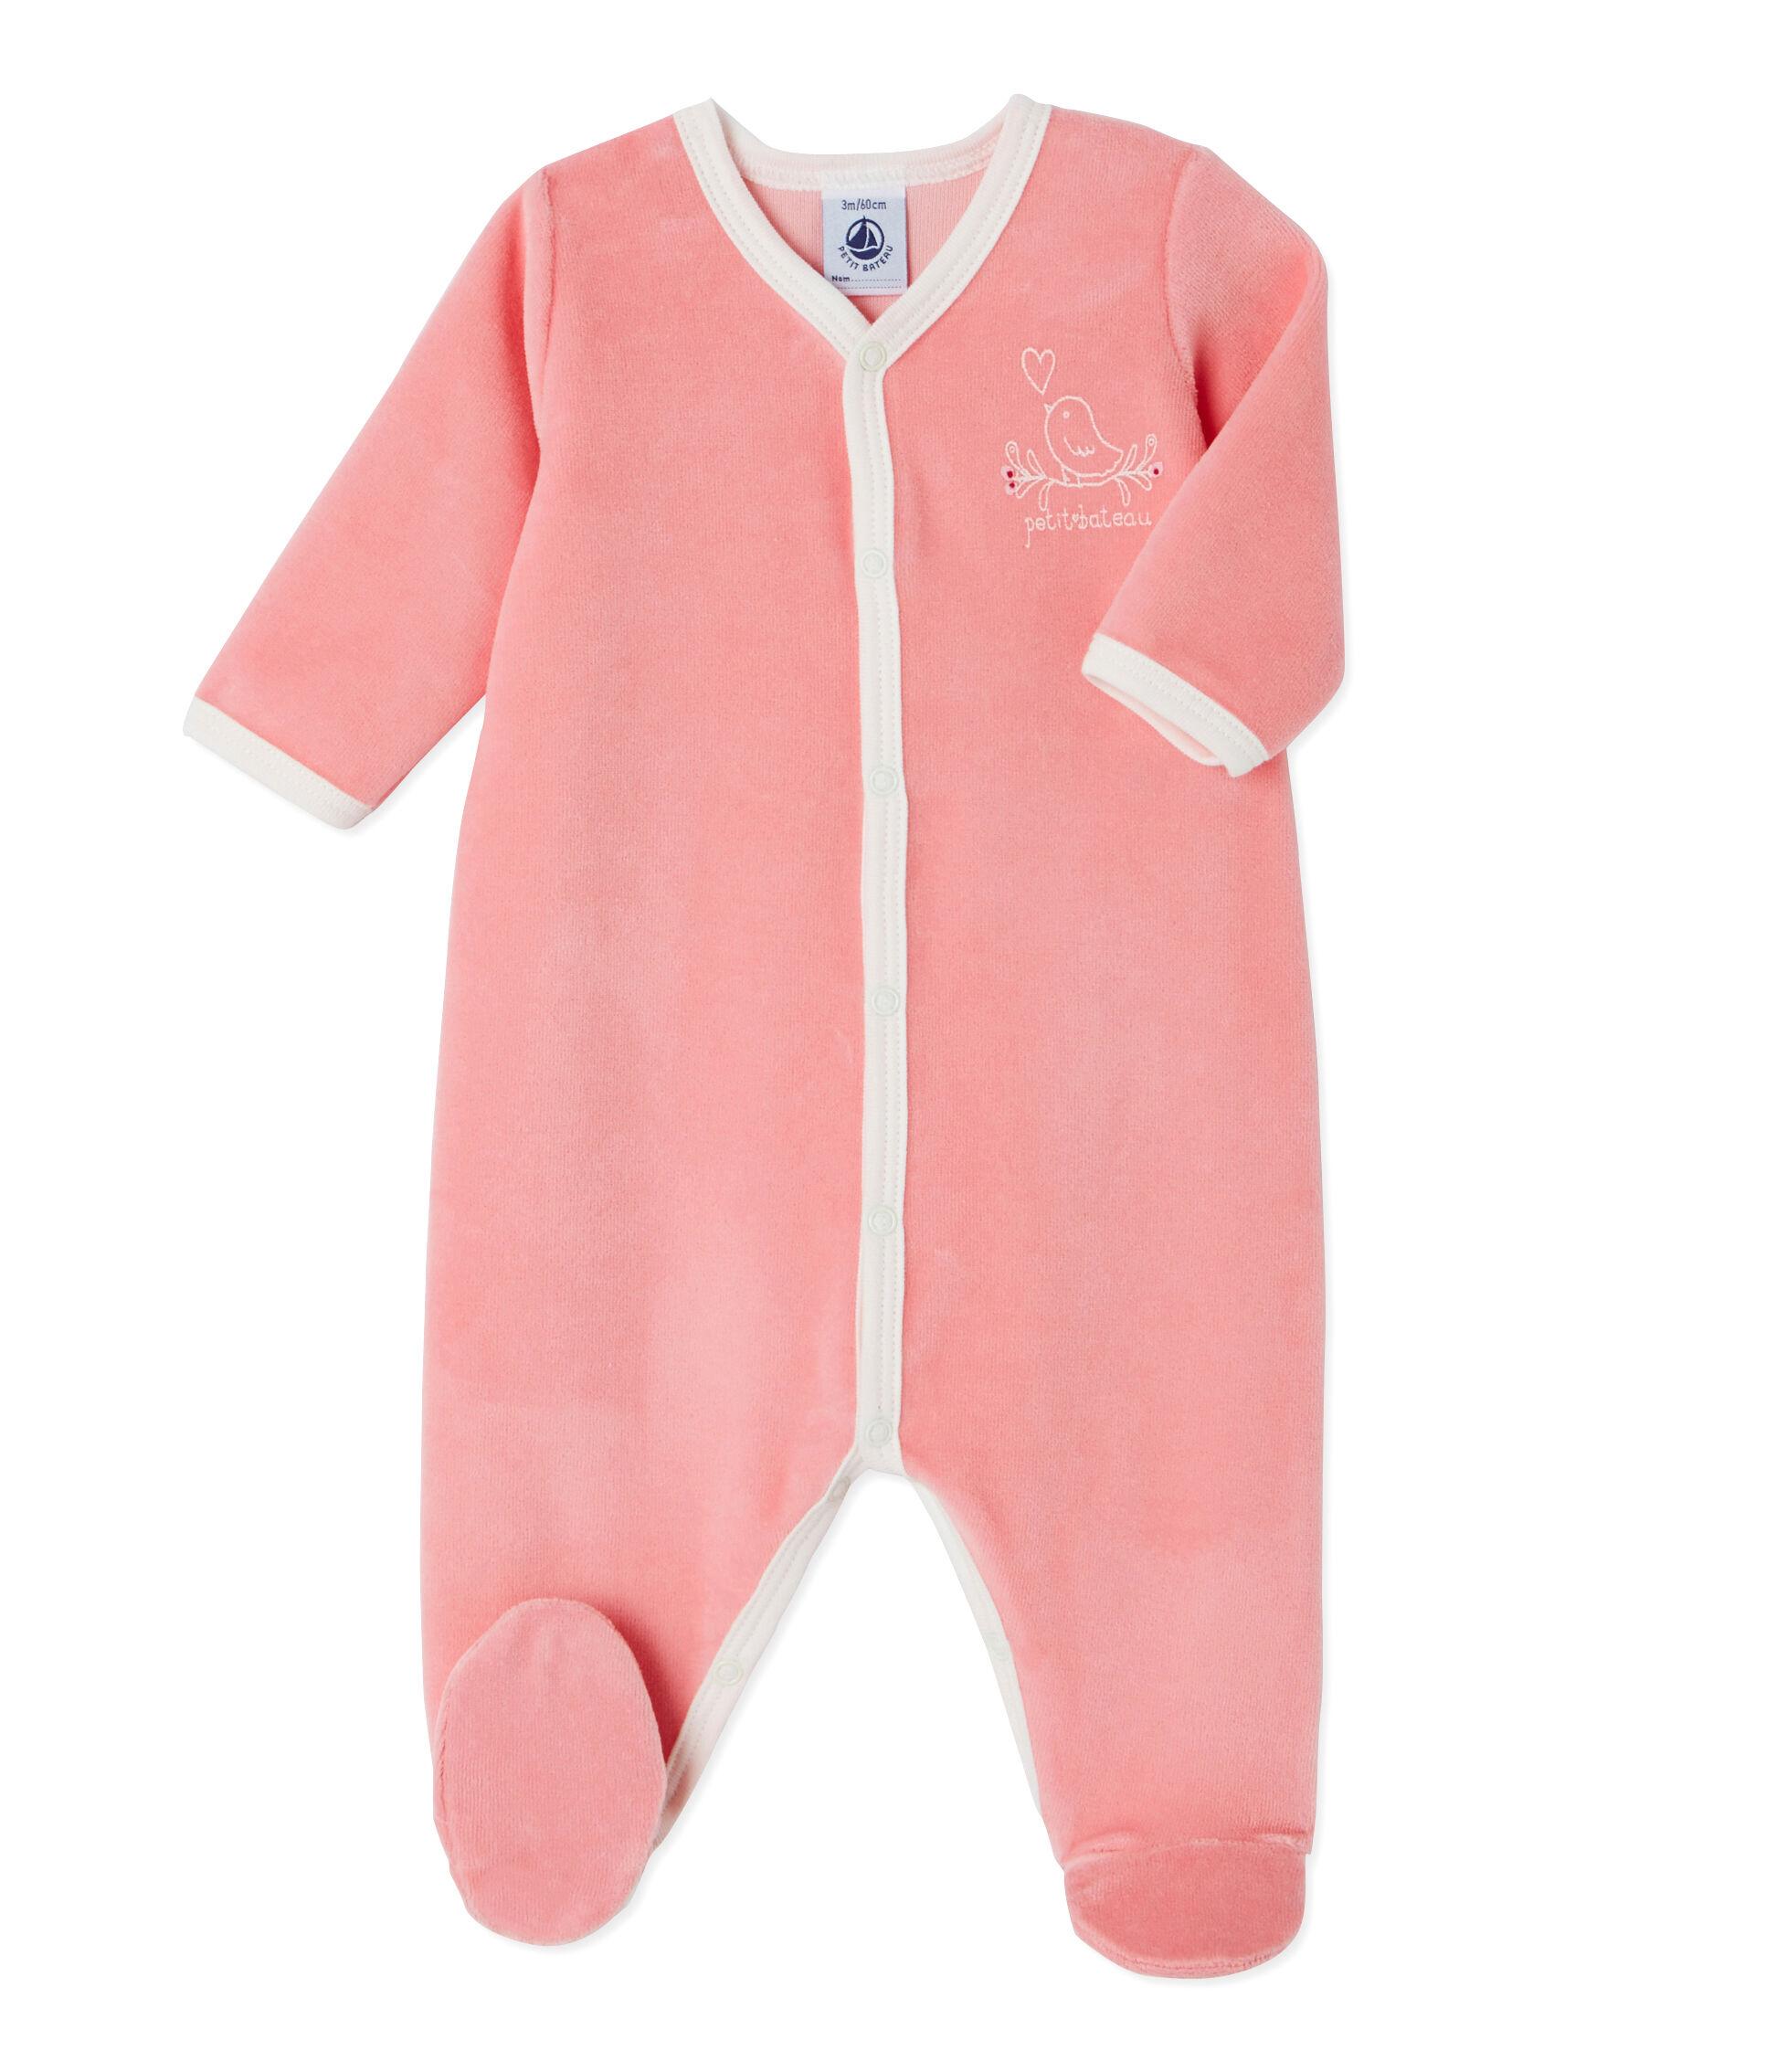 Petit Bateau Unisex Baby Strampler